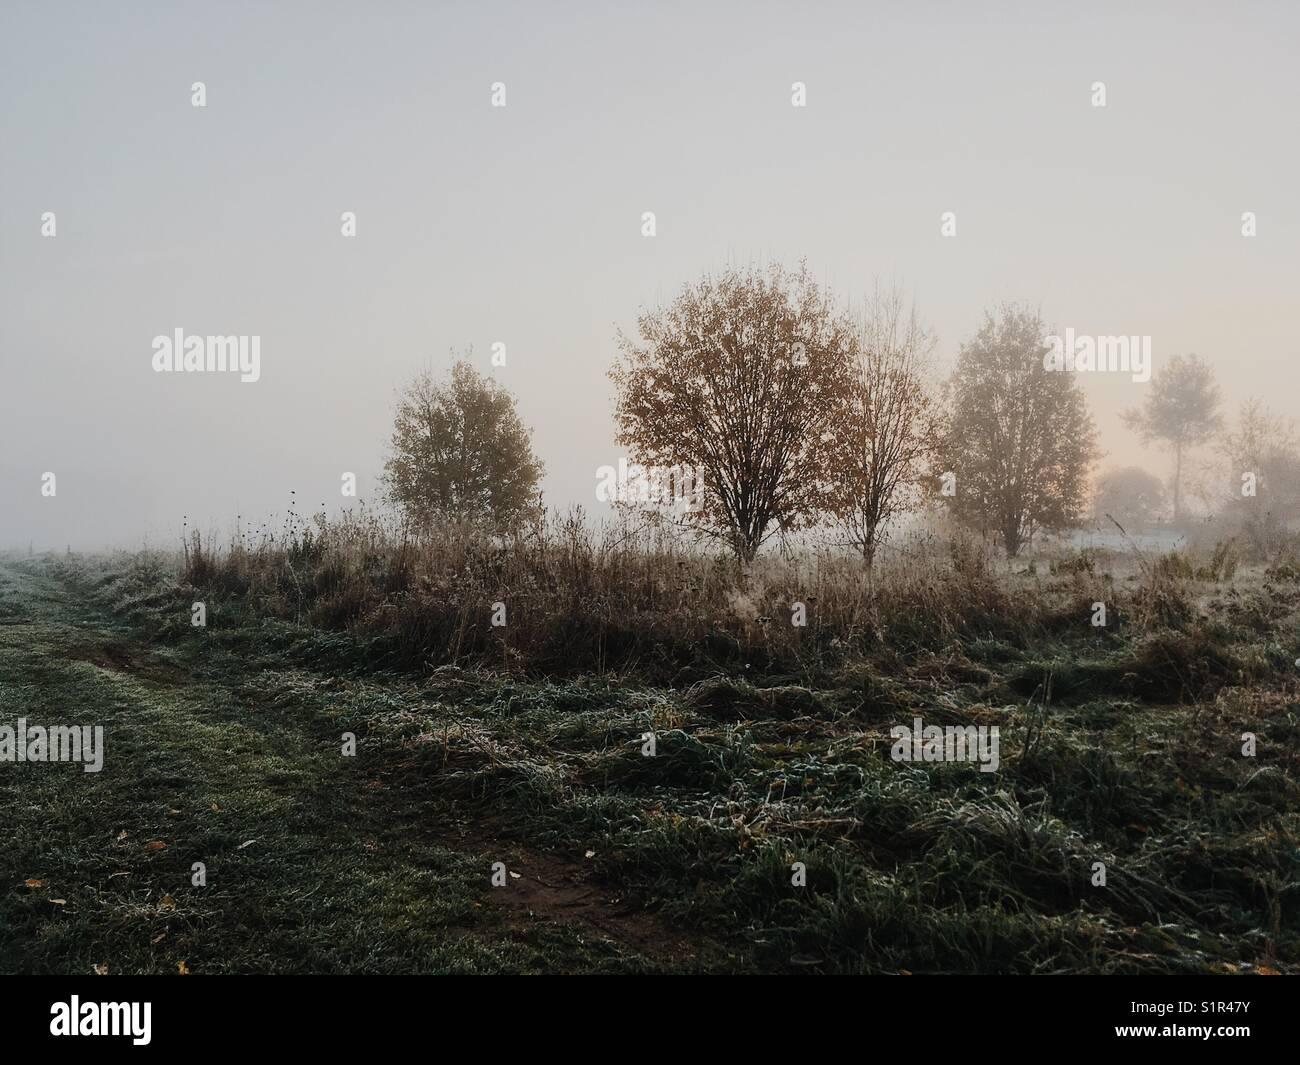 Morning mist. - Stock Image